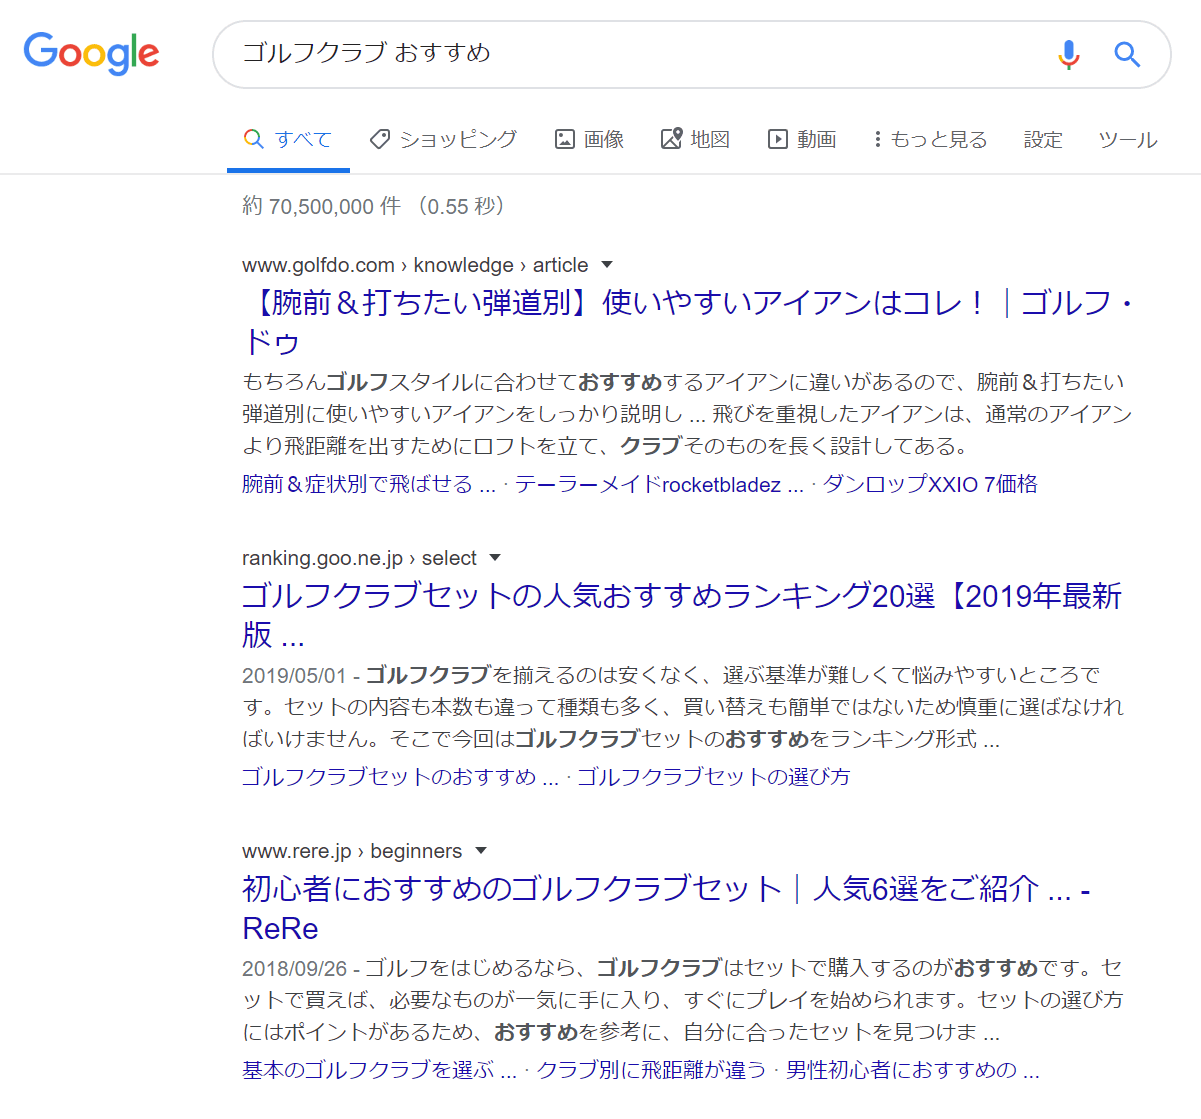 Google検索結果「ゴルフクラブおすすめ」